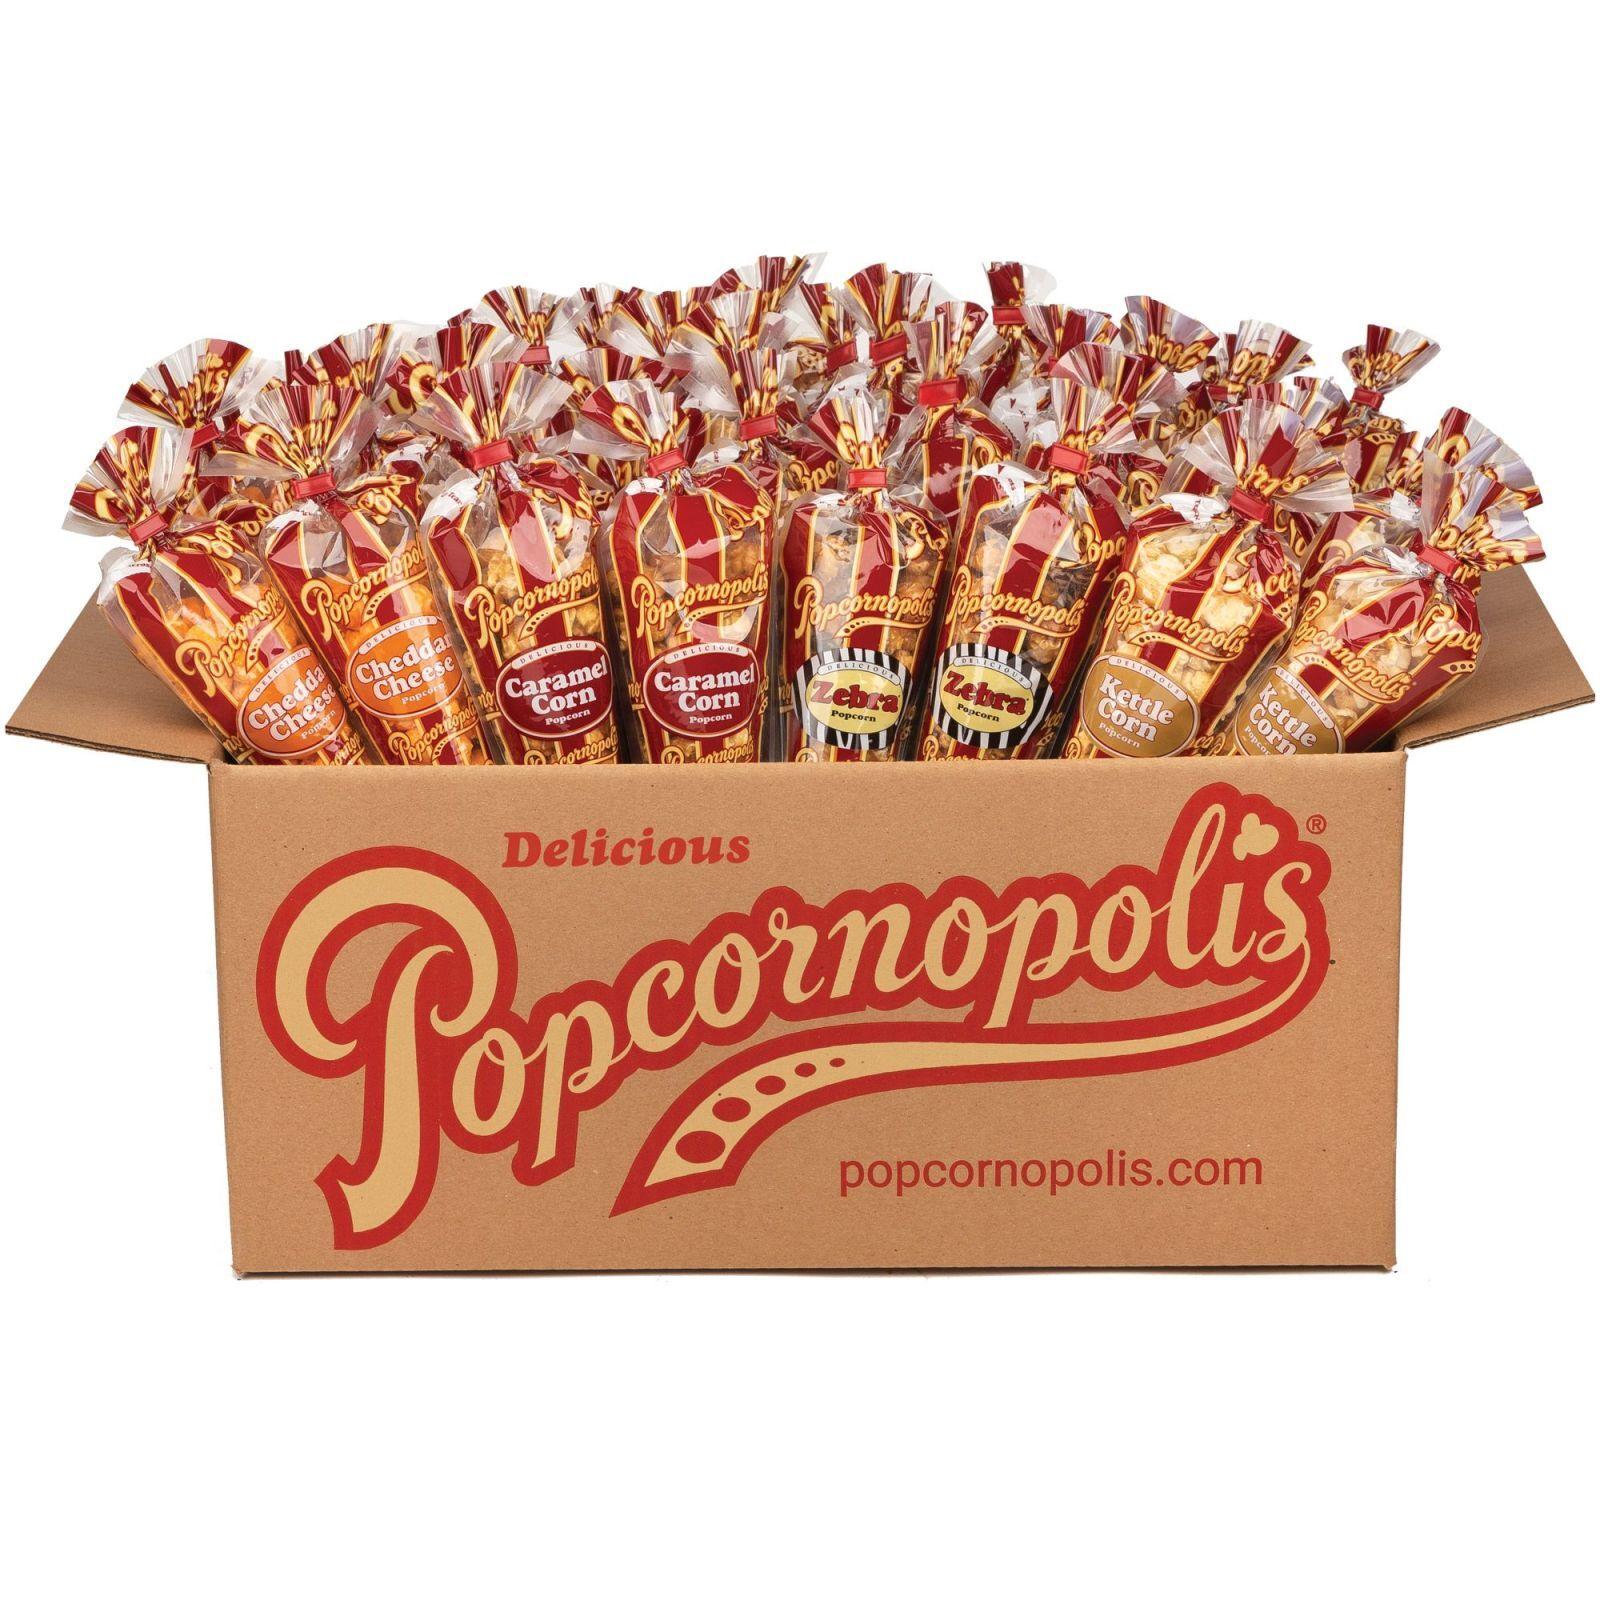 Popcornopolis snacks: Welcome 2020 with a POP!